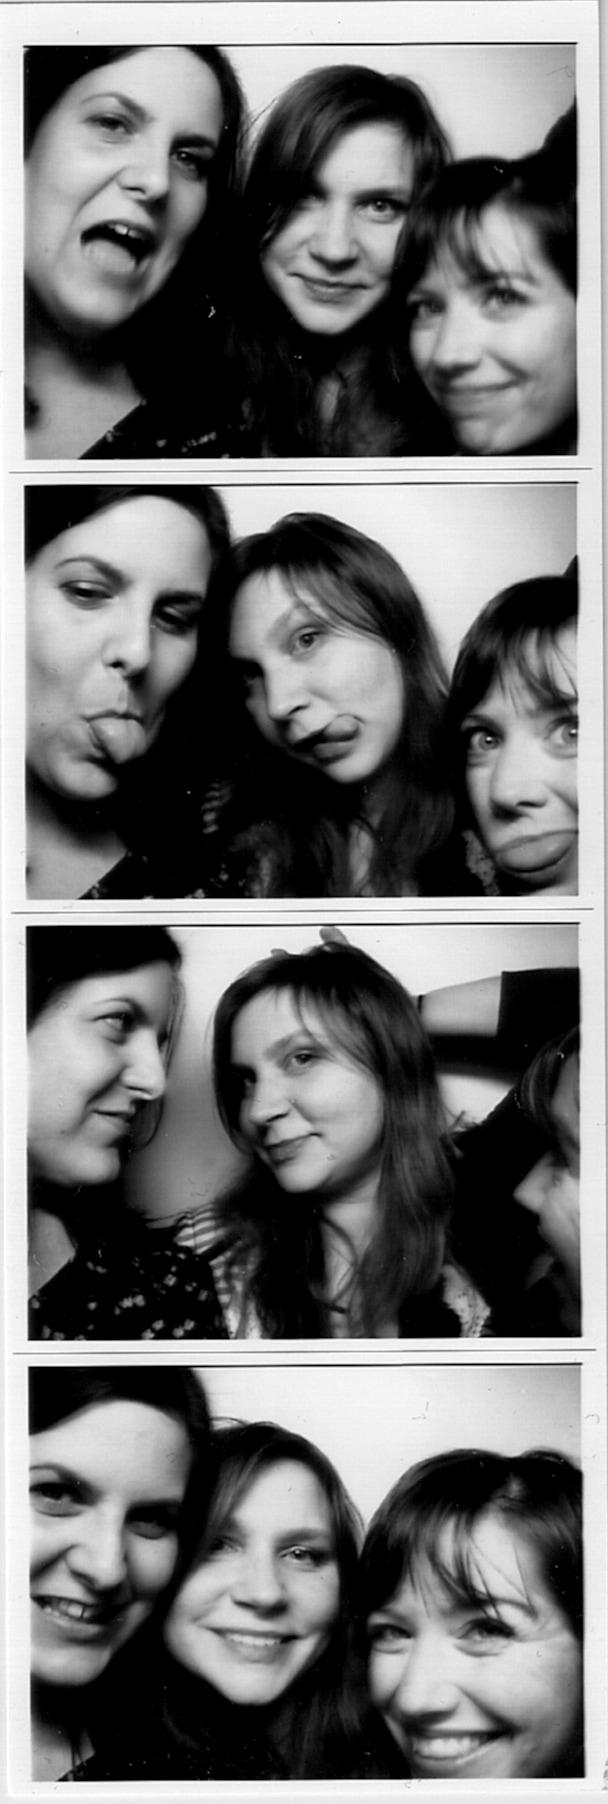 Birthday photobooth photos in Chicago, Illinois